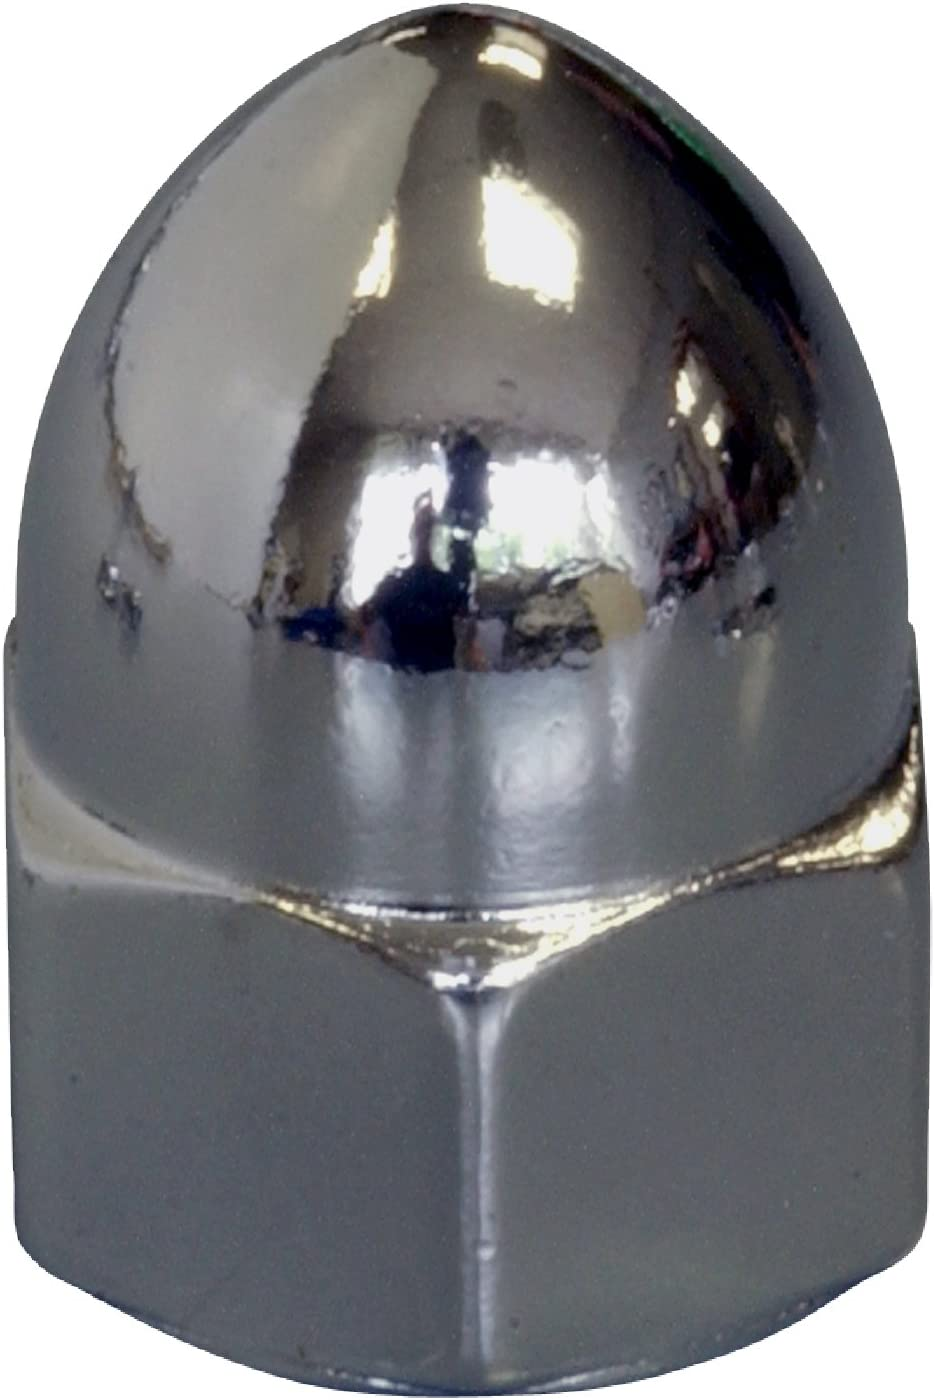 5//16-18-Inch The Hillman Group 943114 Chrome USS Acorn Nut 3-Pack